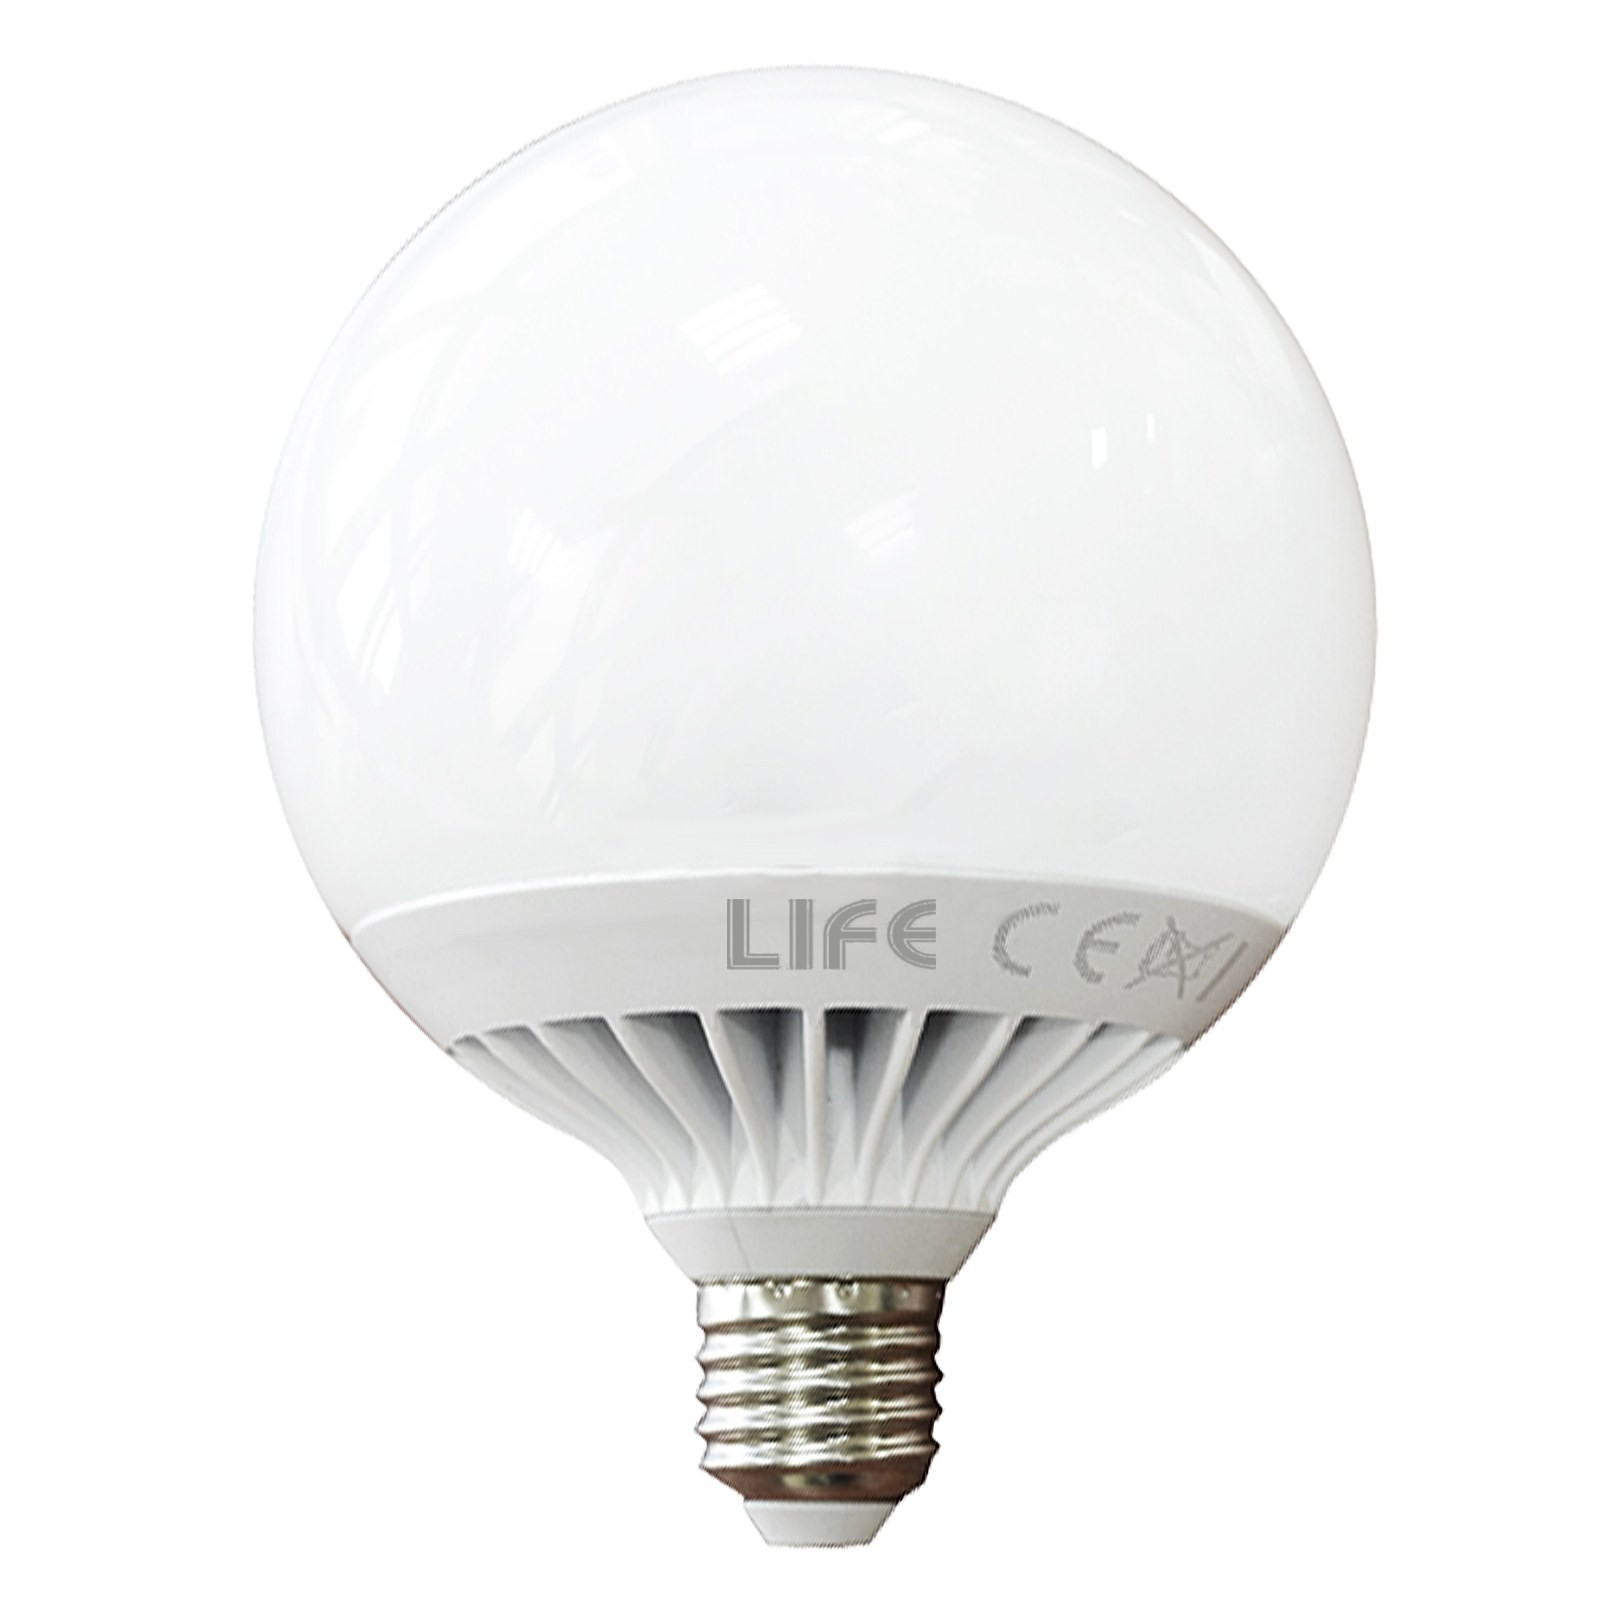 LAMPADA LAMPADINA A LED LUCE FREDDA A GLOBO ATTACCO E27 15 WATT 6500 KELVIN LIFE